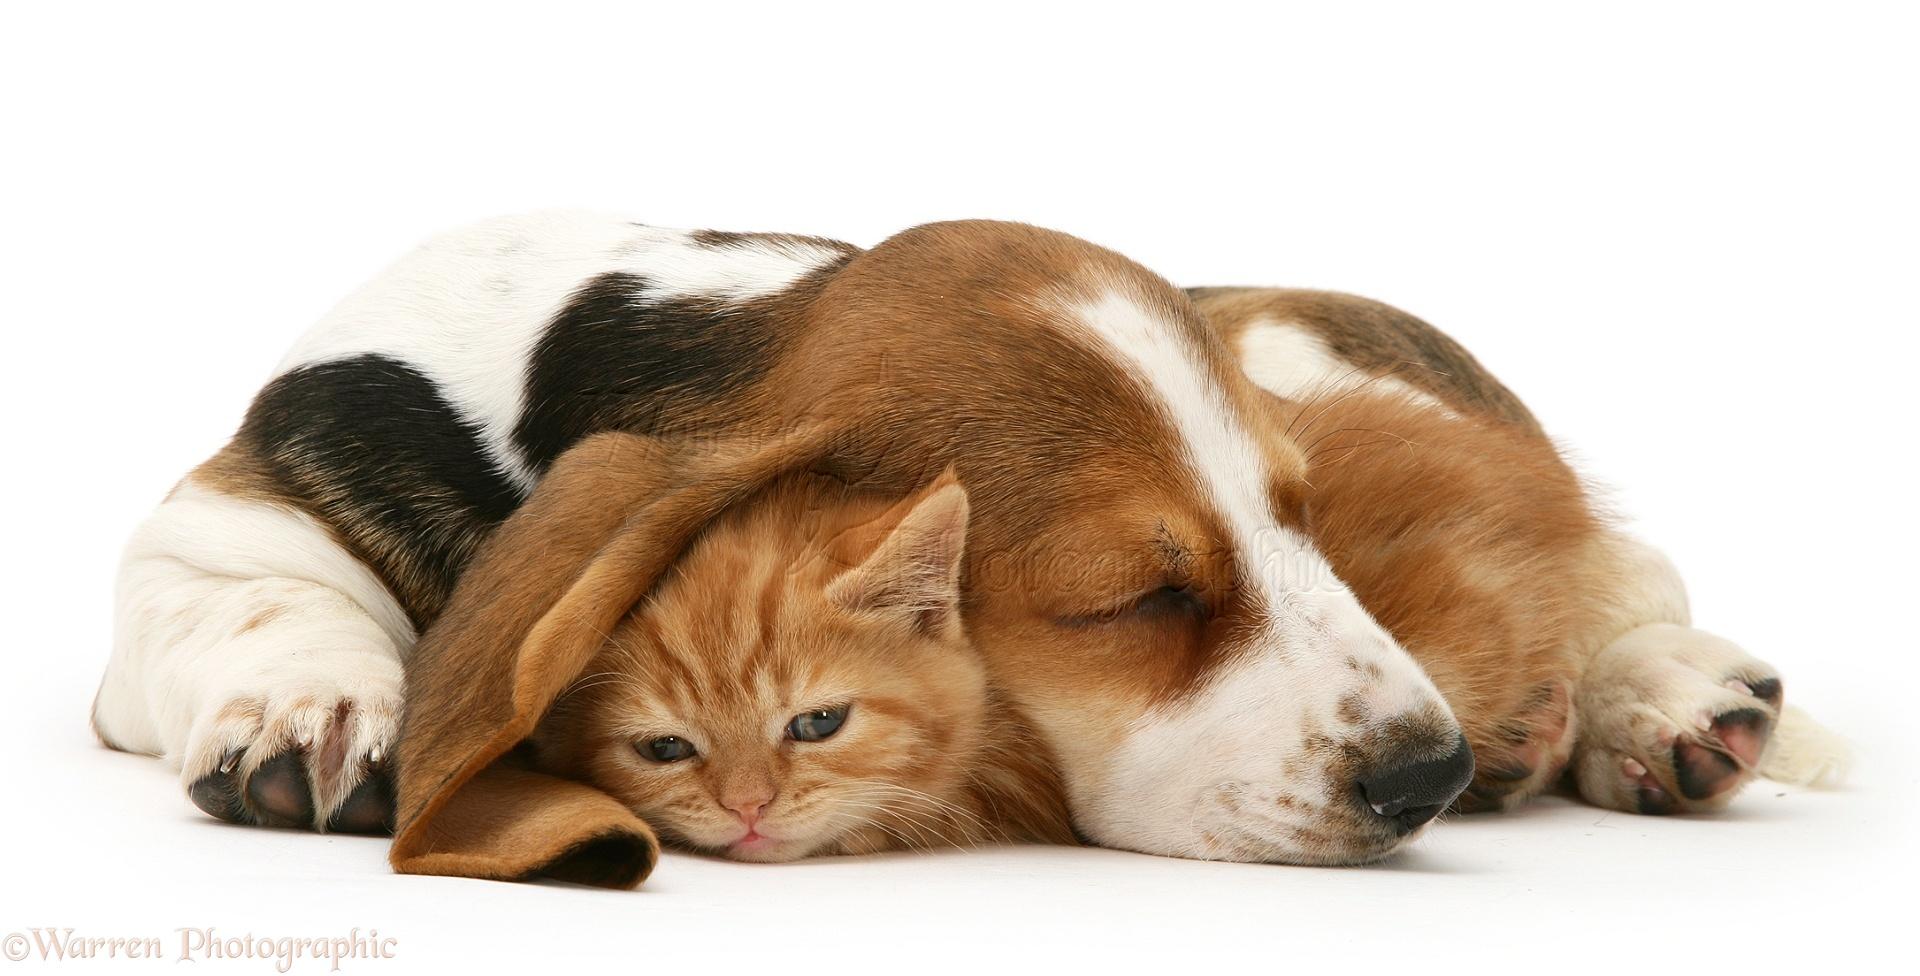 Pets Ginger kitten under the ear of a sleeping Basset pup photo